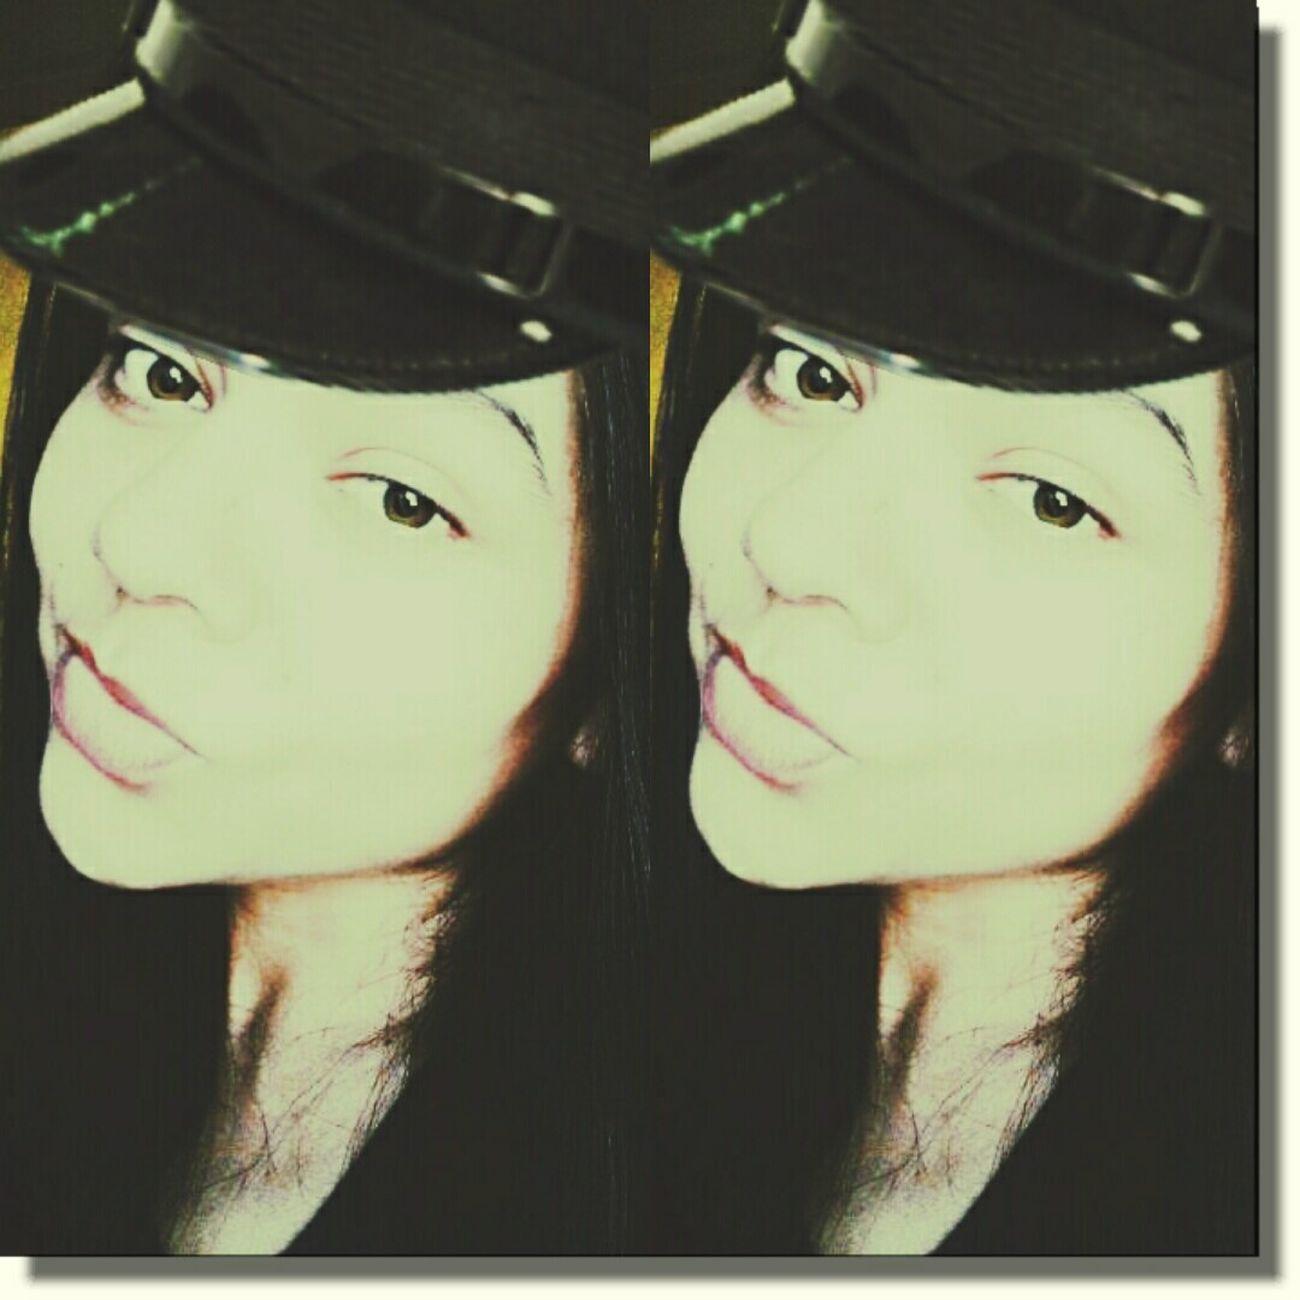 Policegirls Besos ♡ SaludosPeople LosQuiero😚 Lovelovelove 😉😘